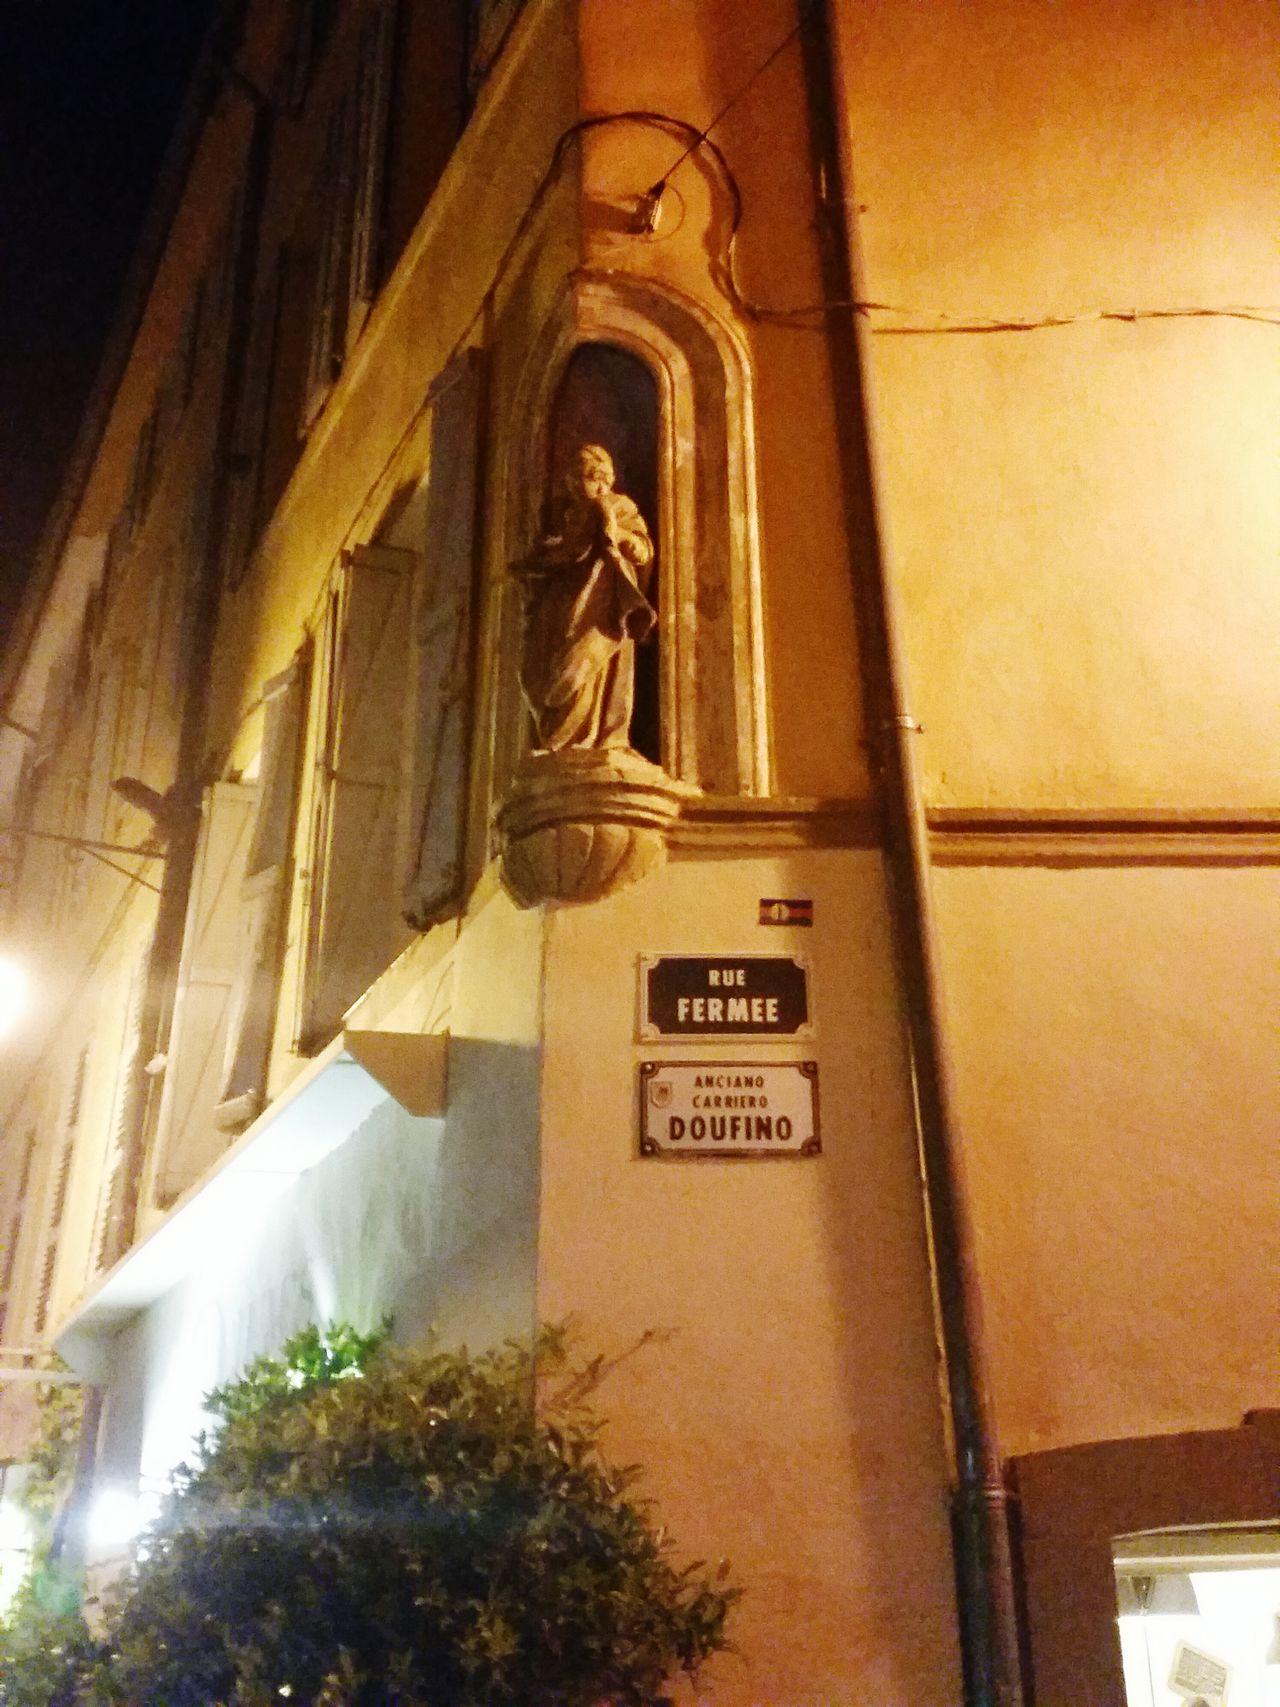 Rue Fermée Street Name Aix En Provence Provence France